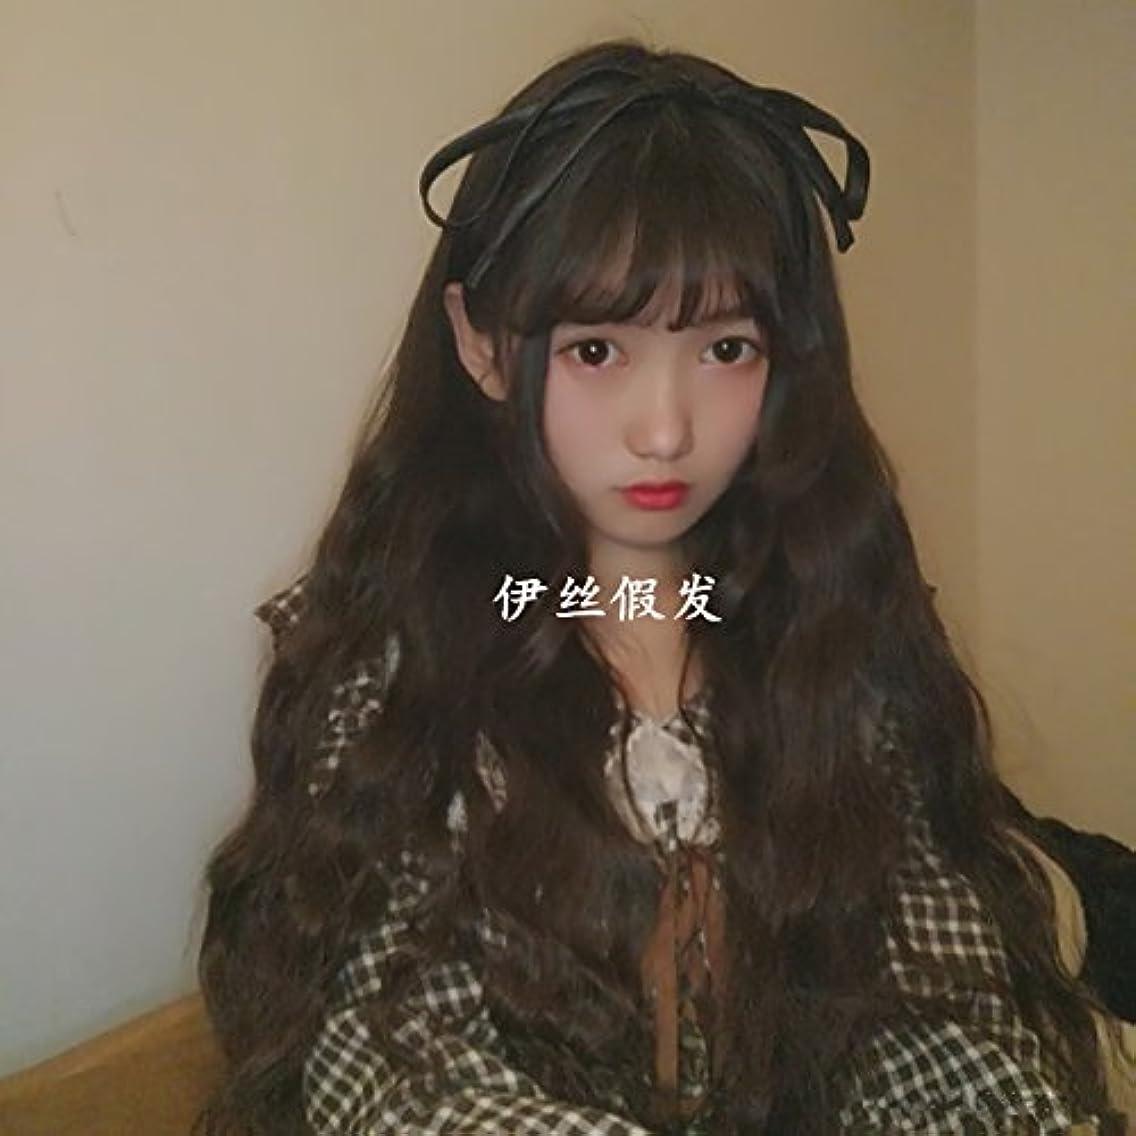 South Korean women girls female long hair wig Liu corn hot air with long red hairnet money fluffy natural and realistic fake hair